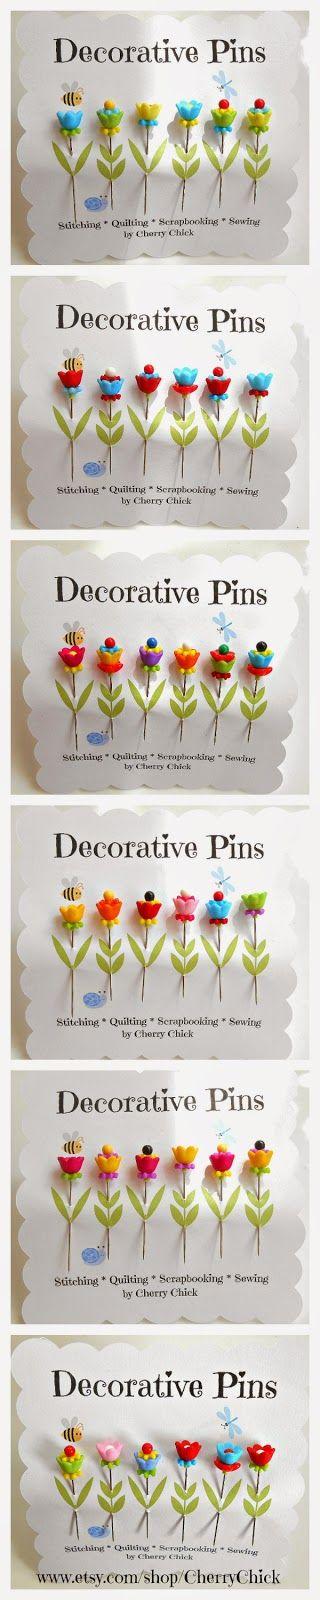 Decorative Flower Pins Collage... Sewing Pins, Quilting Pins, Pincushion Pins, Scrapbooking Pins, Card making Pins #CherryChick